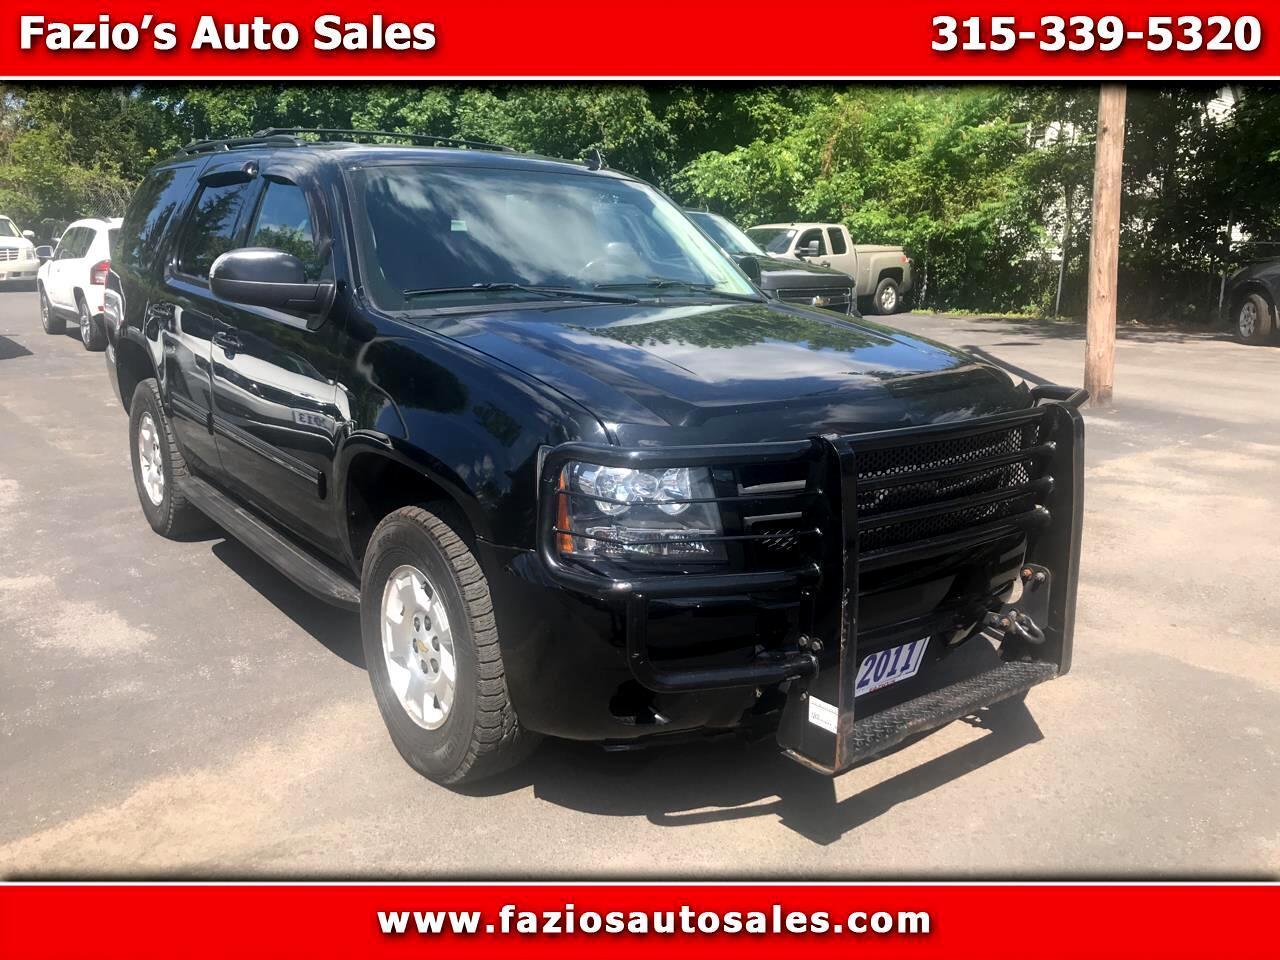 2011 Chevrolet Tahoe 4dr 1500 4WD LT